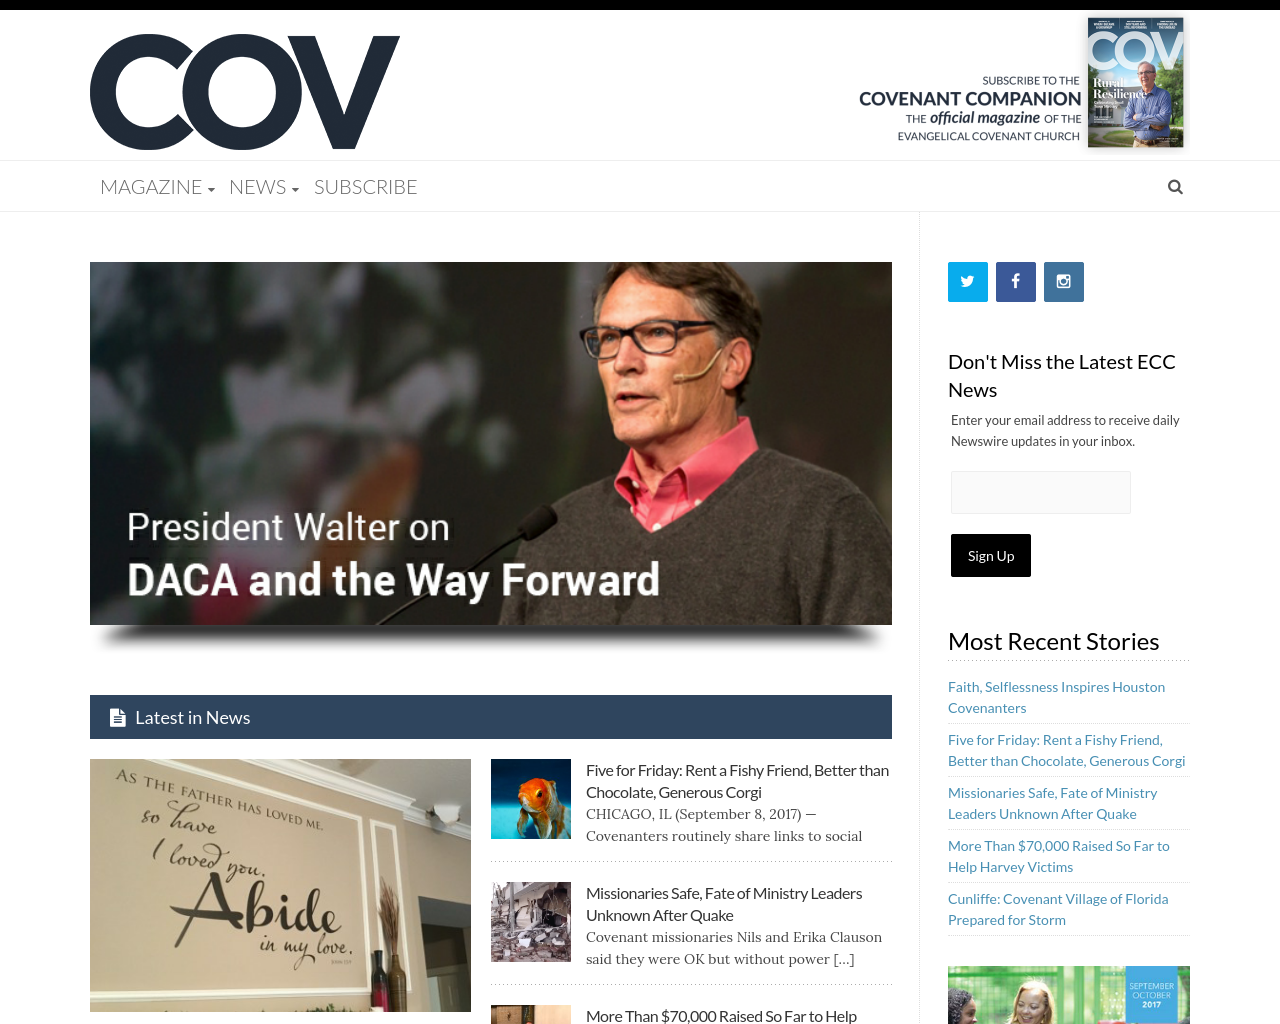 Covenantcompanion.com-Advertising-Reviews-Pricing